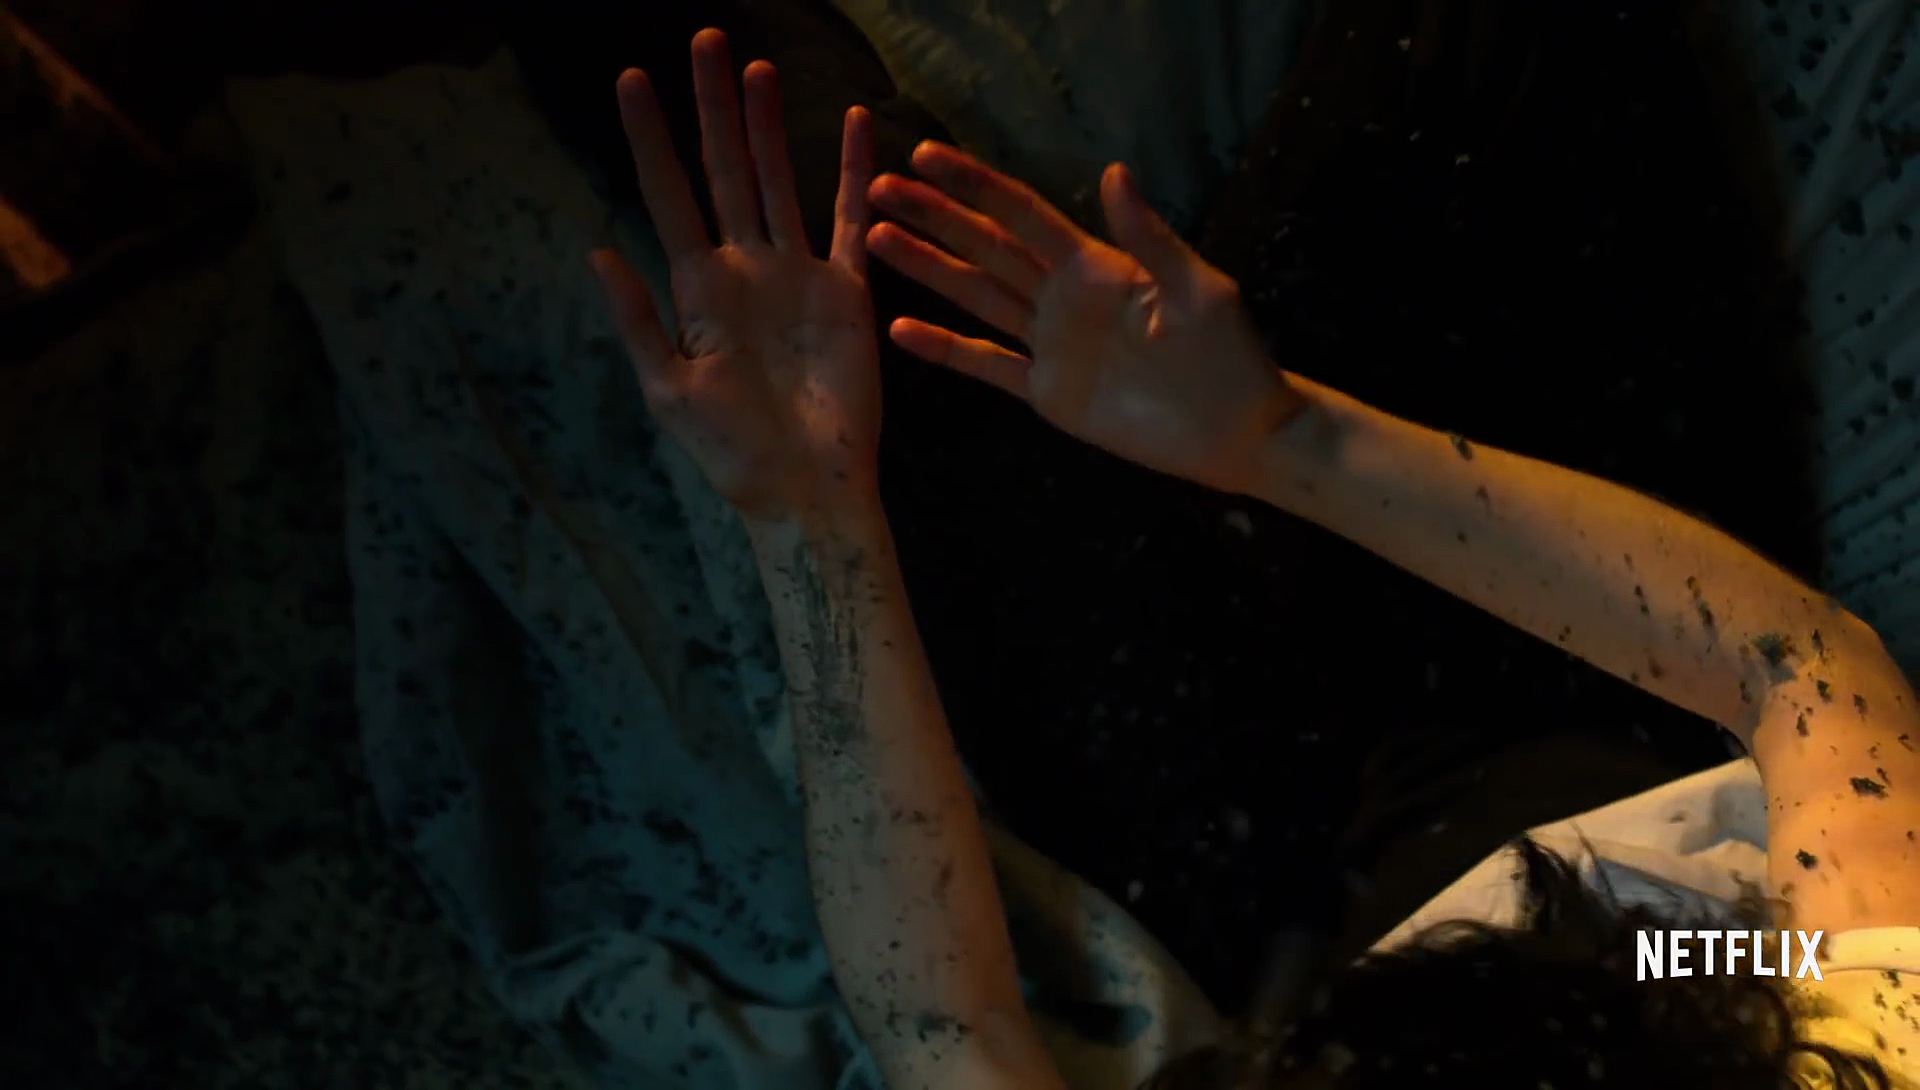 Jessica Jones Season 2 Trailer Breakdown 18 Details You Missed